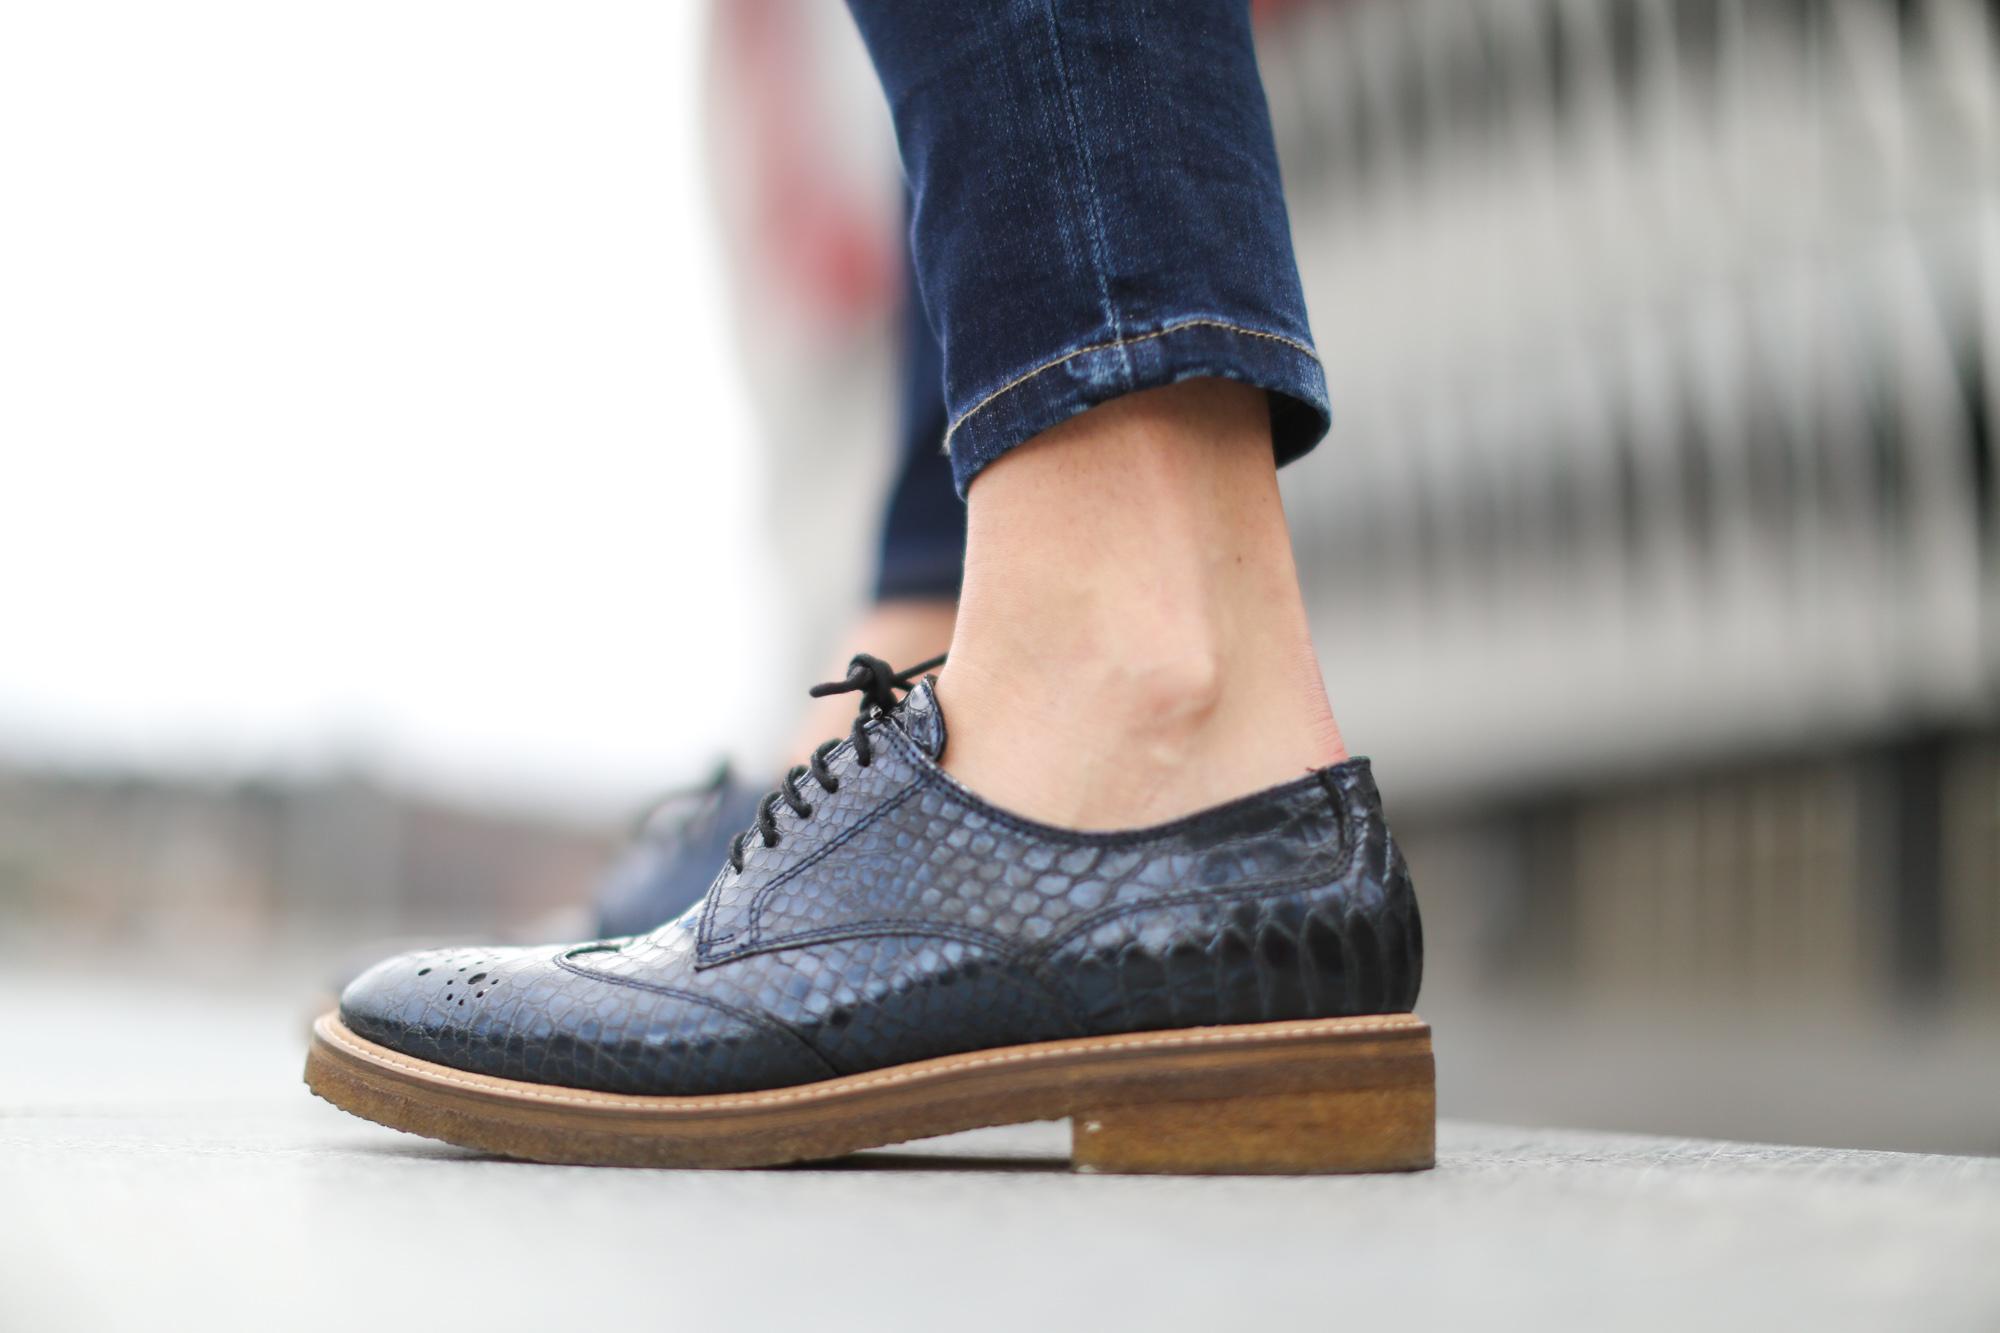 Clochet-streetstyle-bimbaylola-blue-knit-topshop-baxter-jeans-sushibag-15